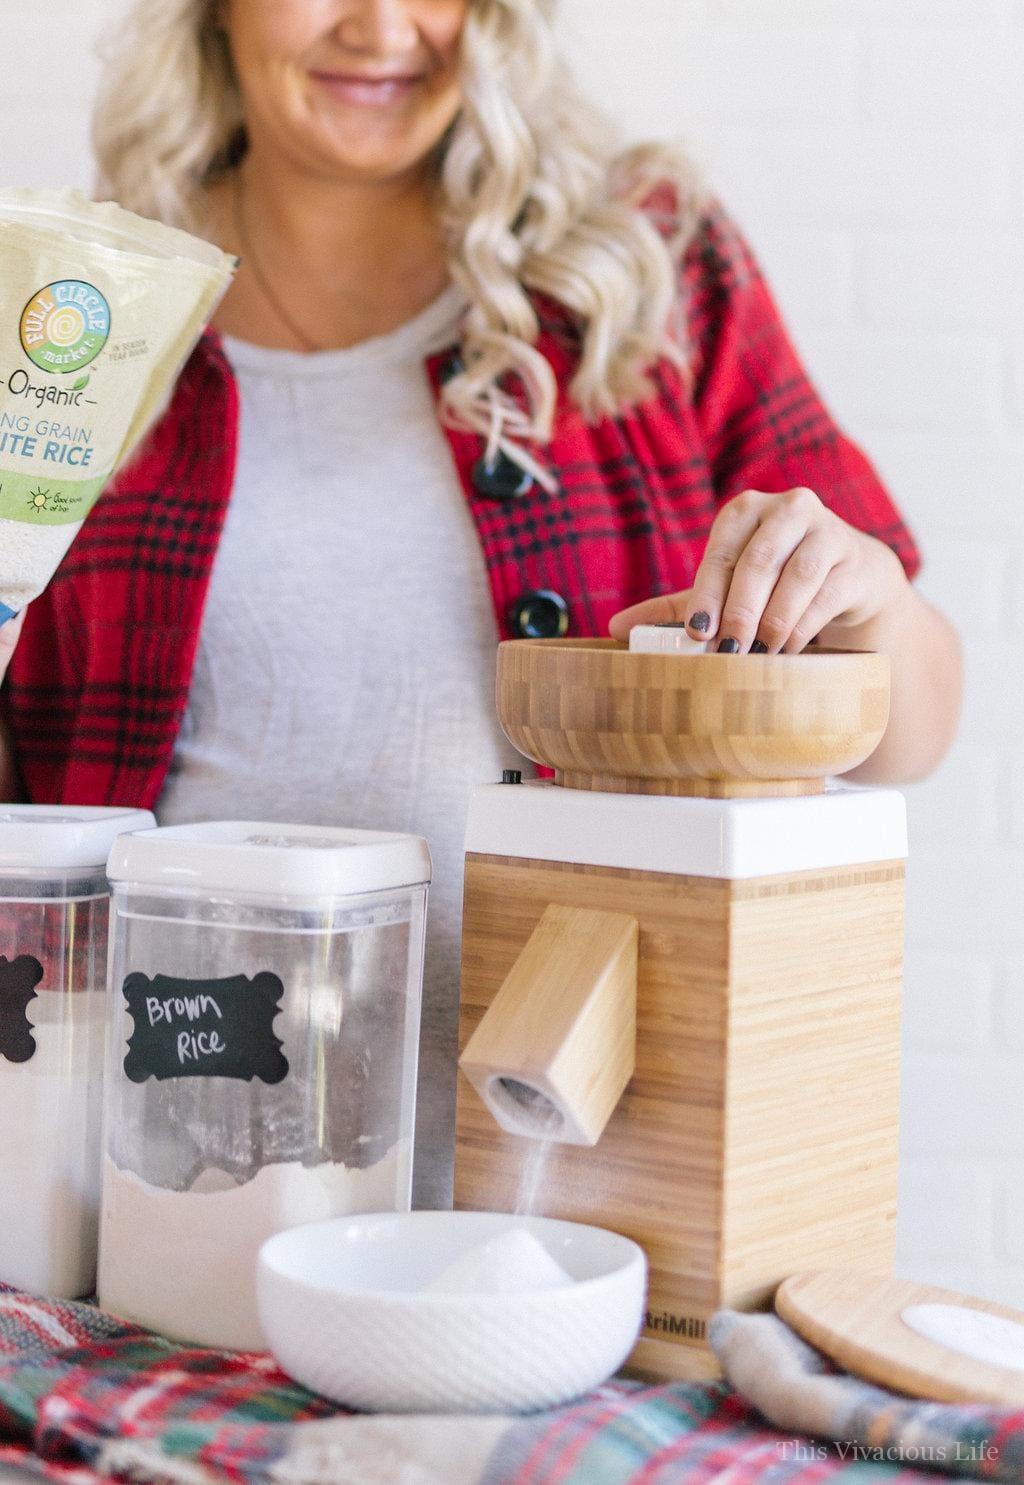 Wood Nutrimill flour grinder with blonde women behind it